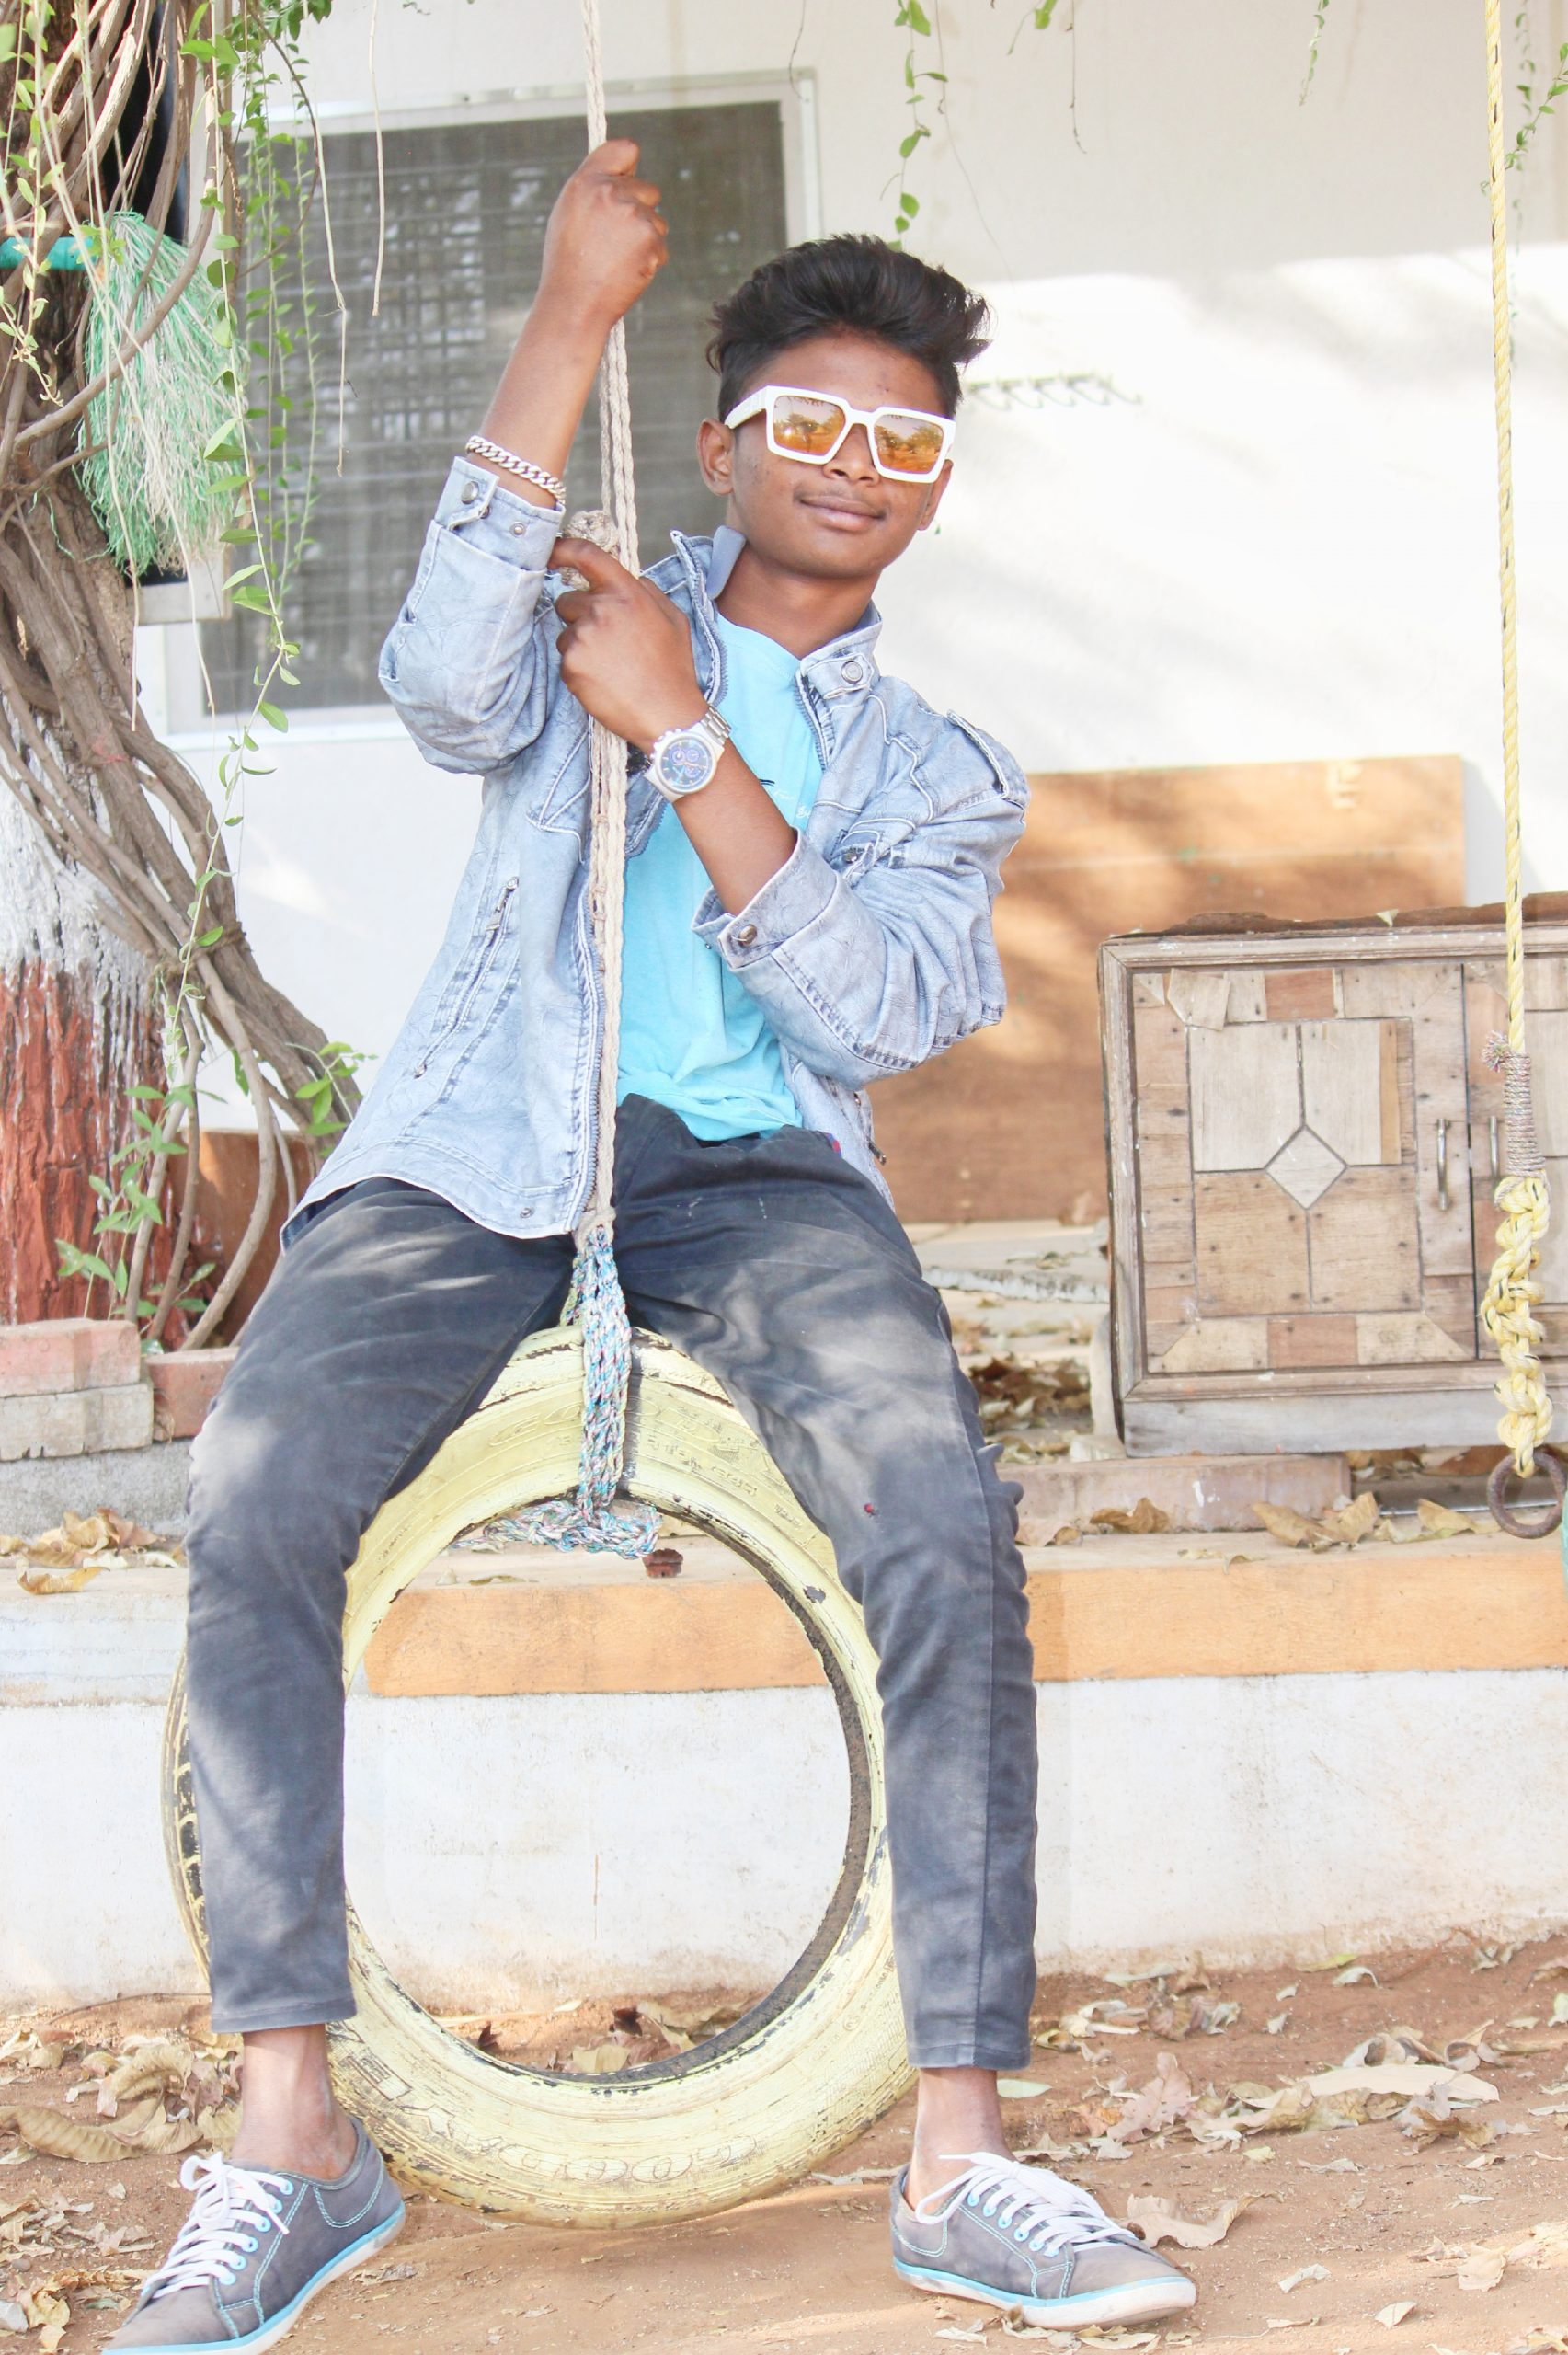 Stylish boy posing on the tyre swing